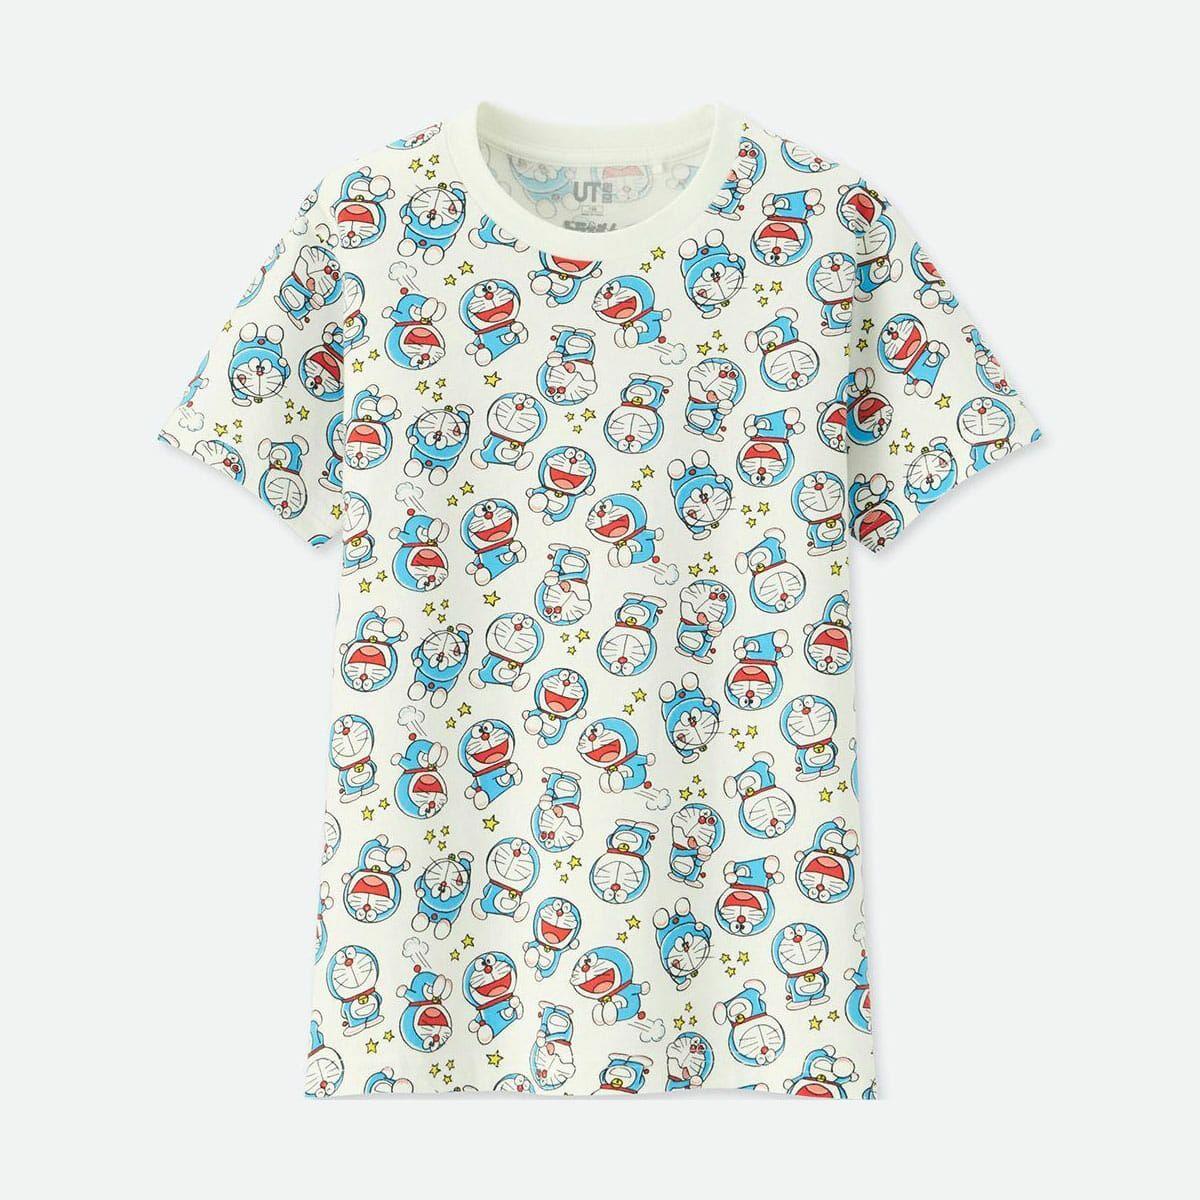 Takashi Murakami x Doraemon Collection is coming to UNIQLO